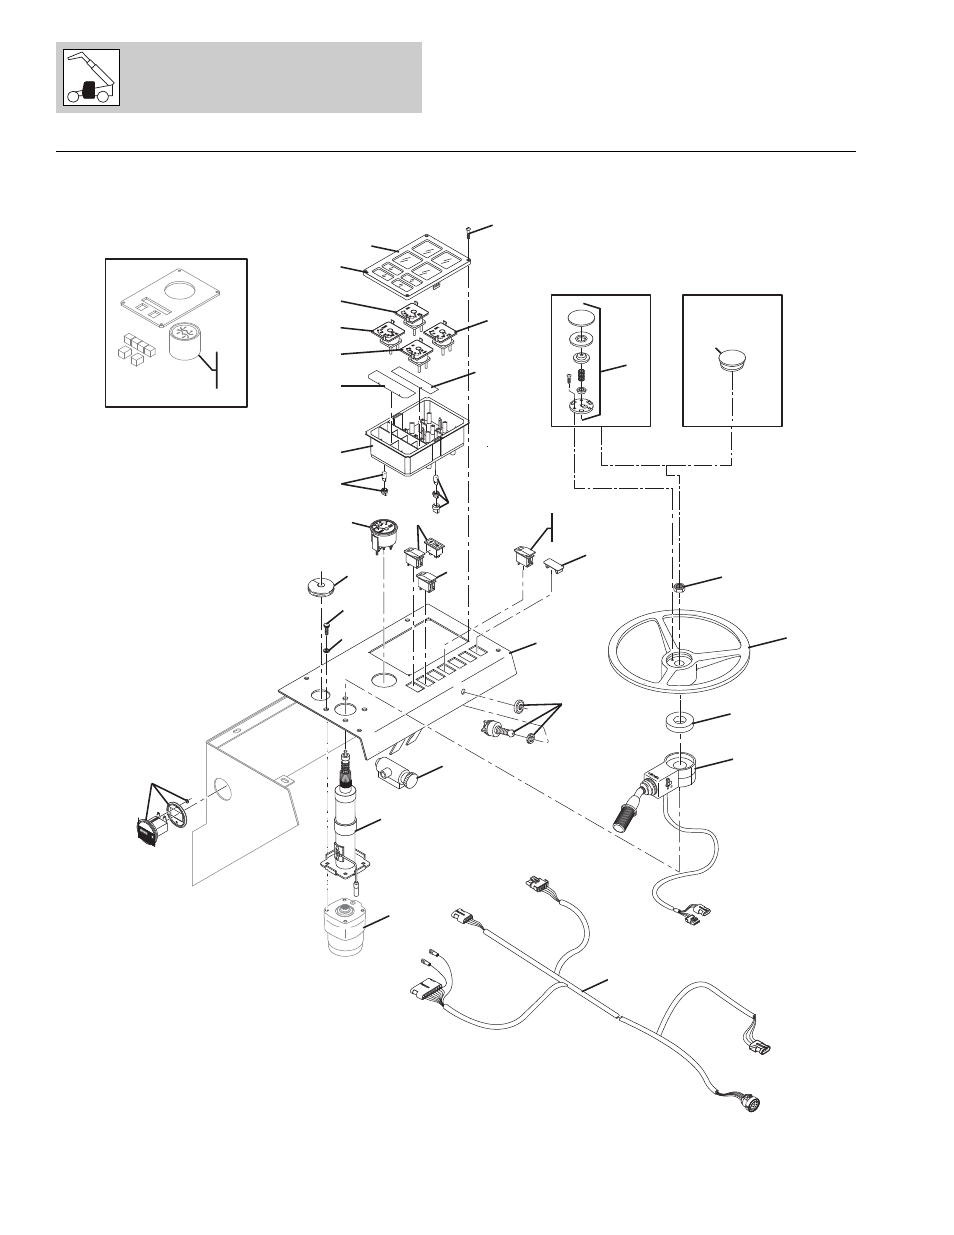 Figure 6-8 instrument panel assembly, Instrument panel